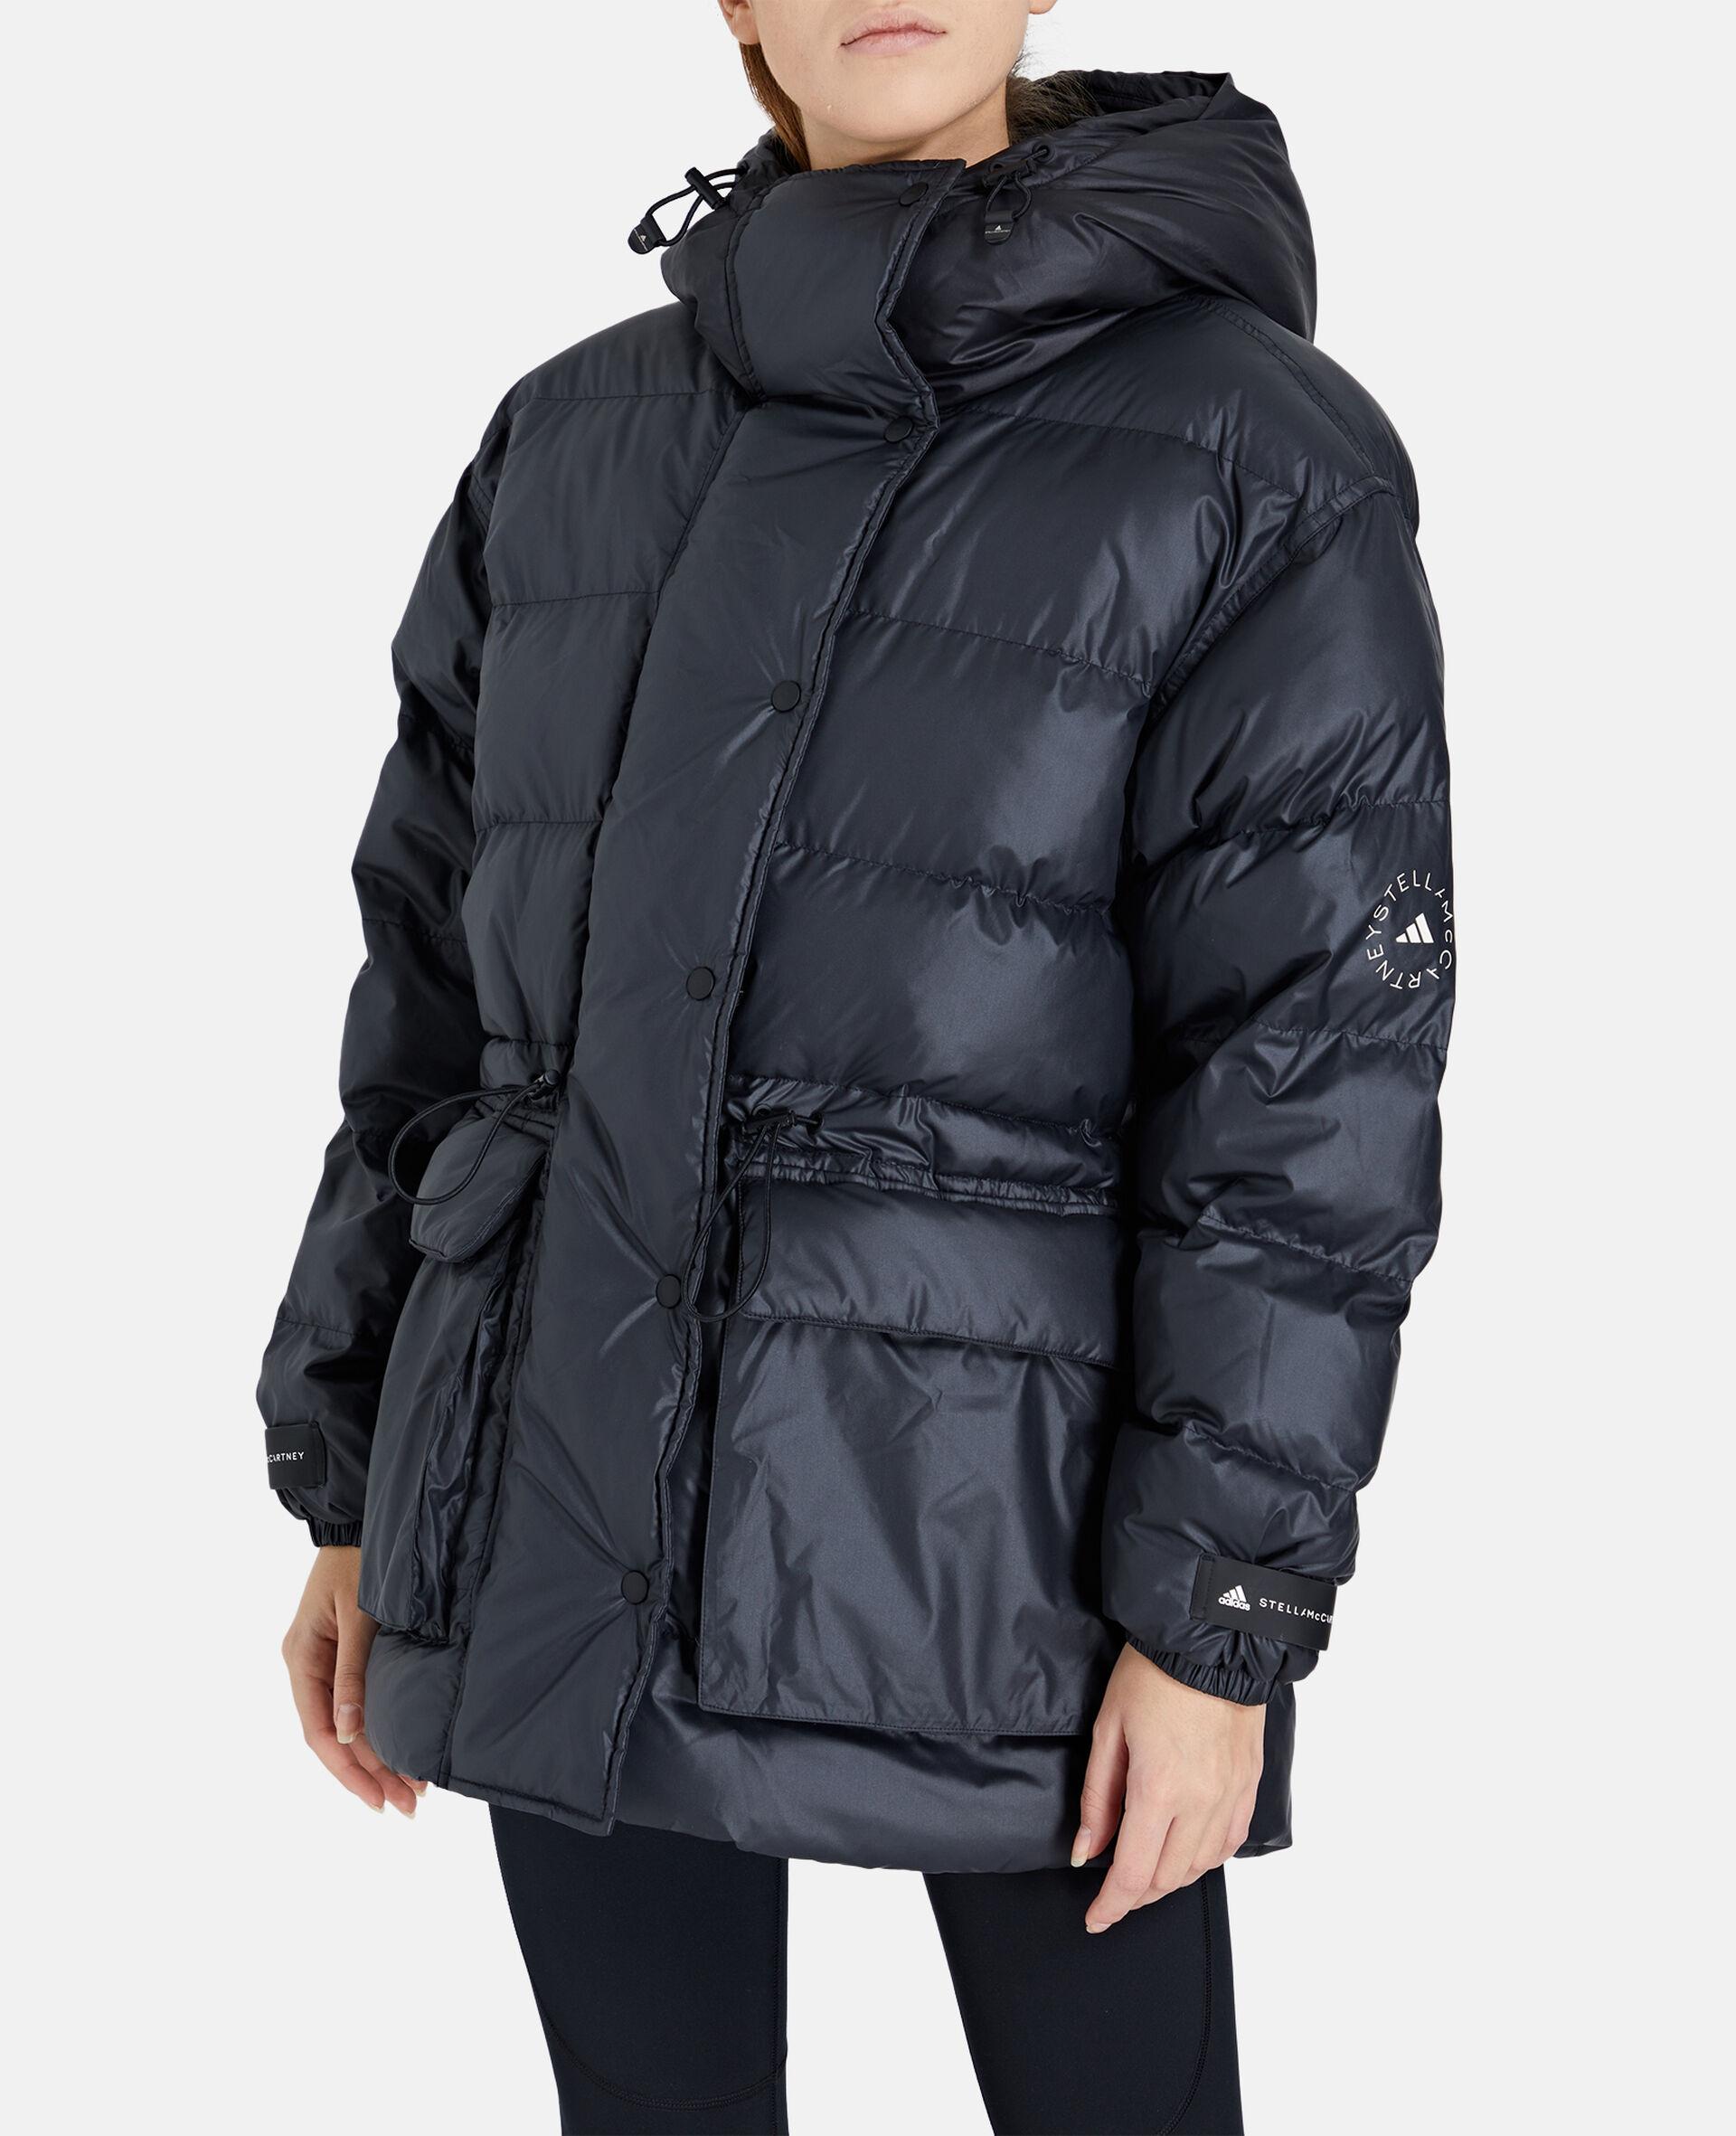 2-in-1 Mid-Length Padded Jacket-Black-large image number 4